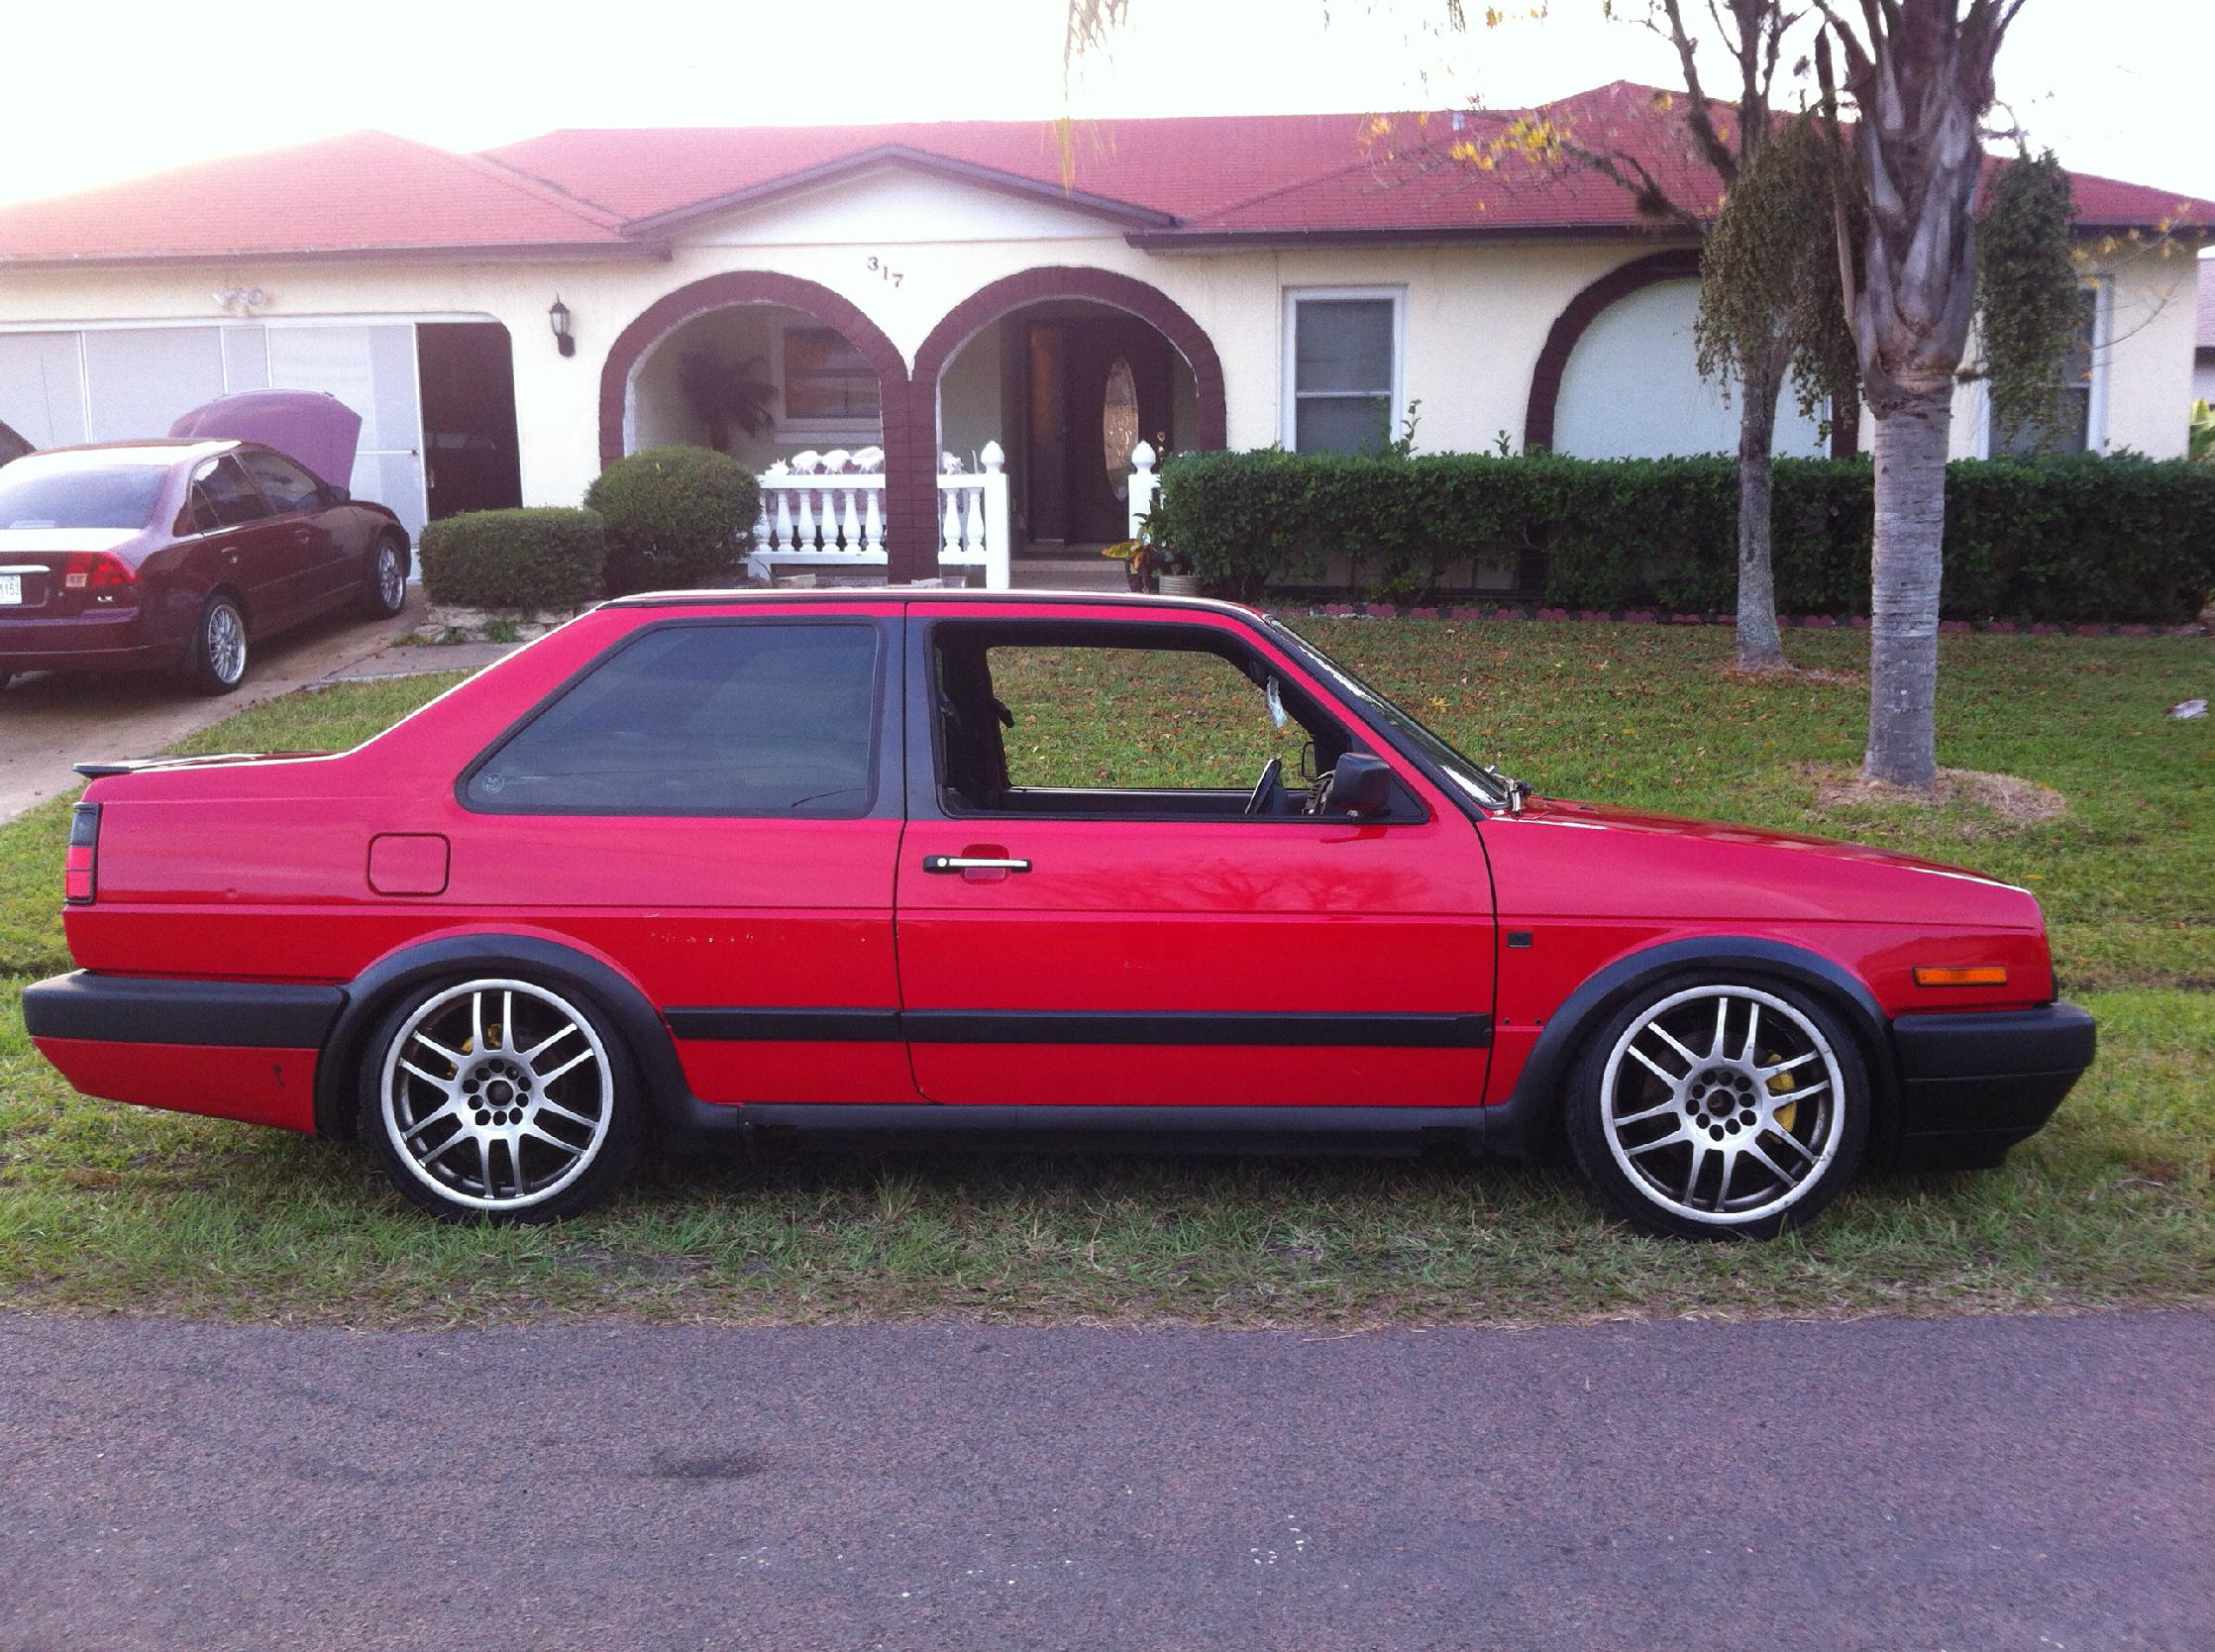 1990 Volkswagen Jetta Information And Photos Neo Drive